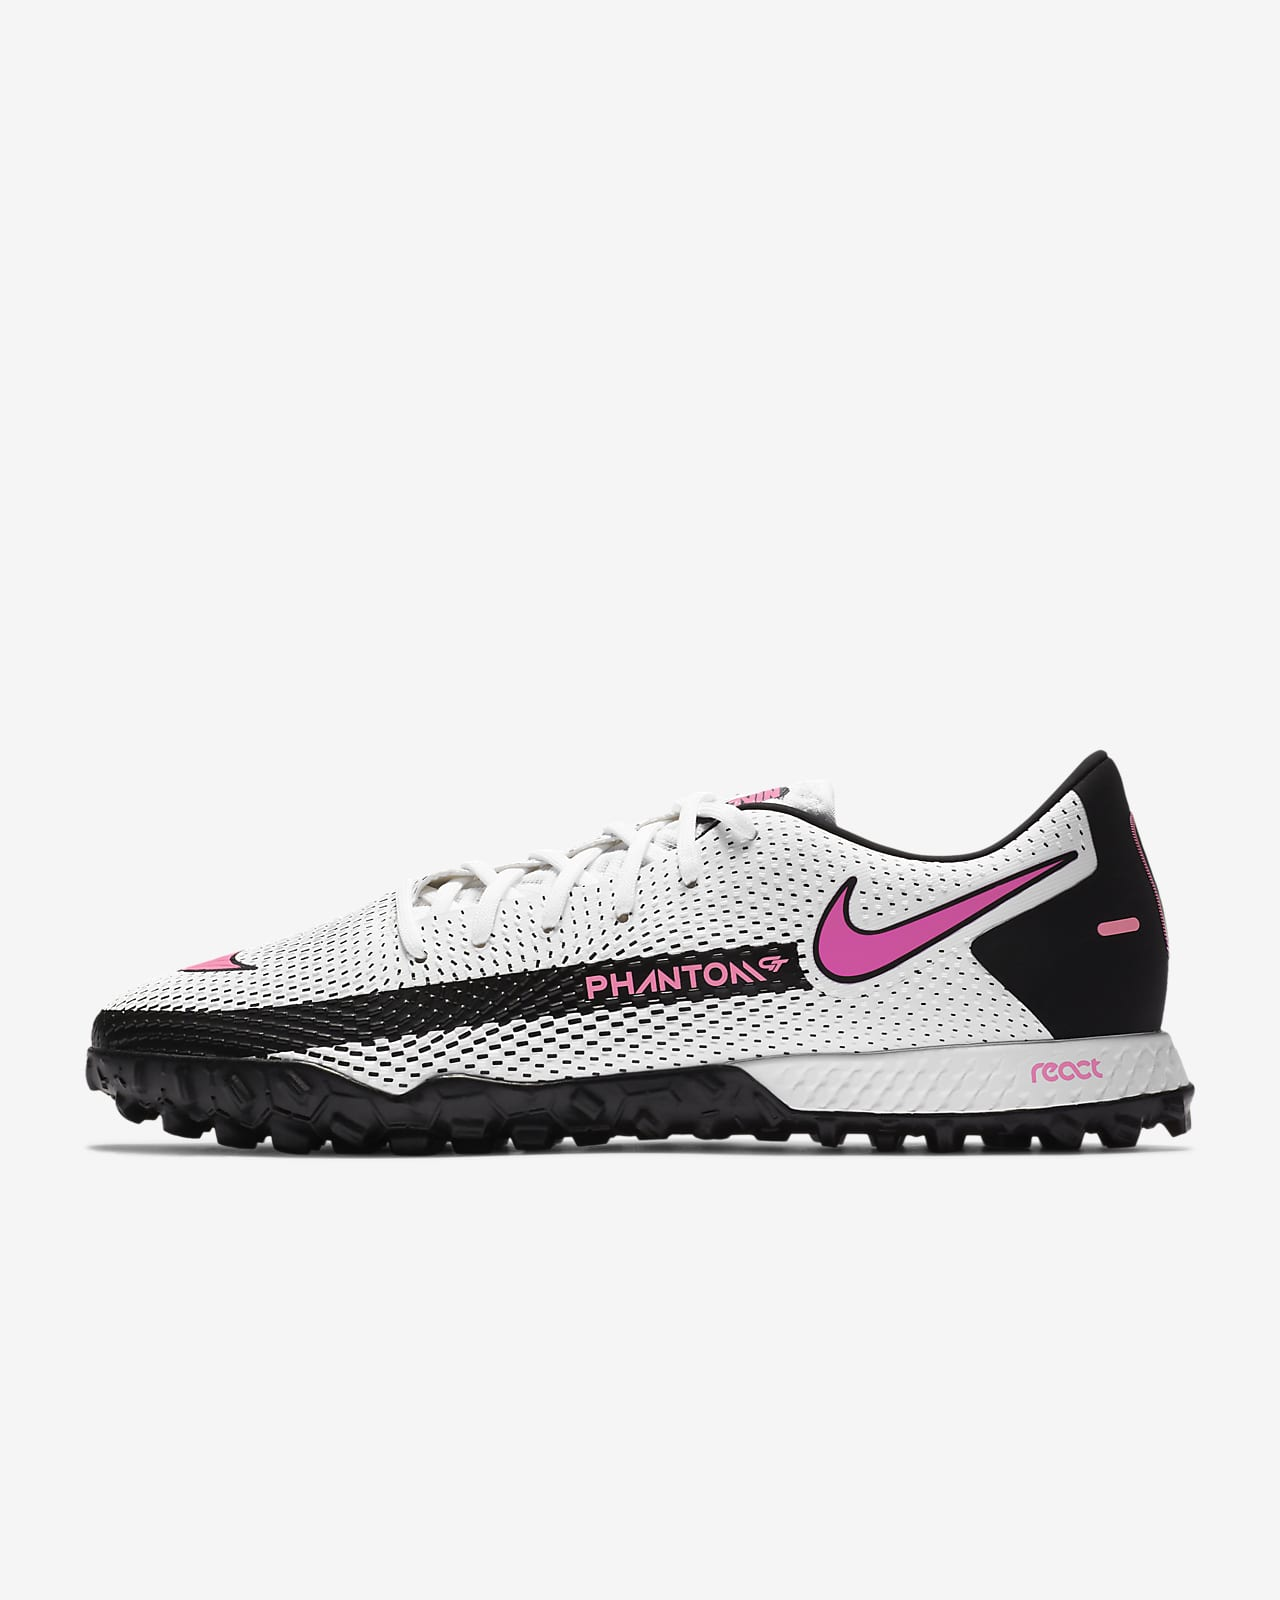 Nike React Phantom GT Pro TF Turf Soccer Shoe